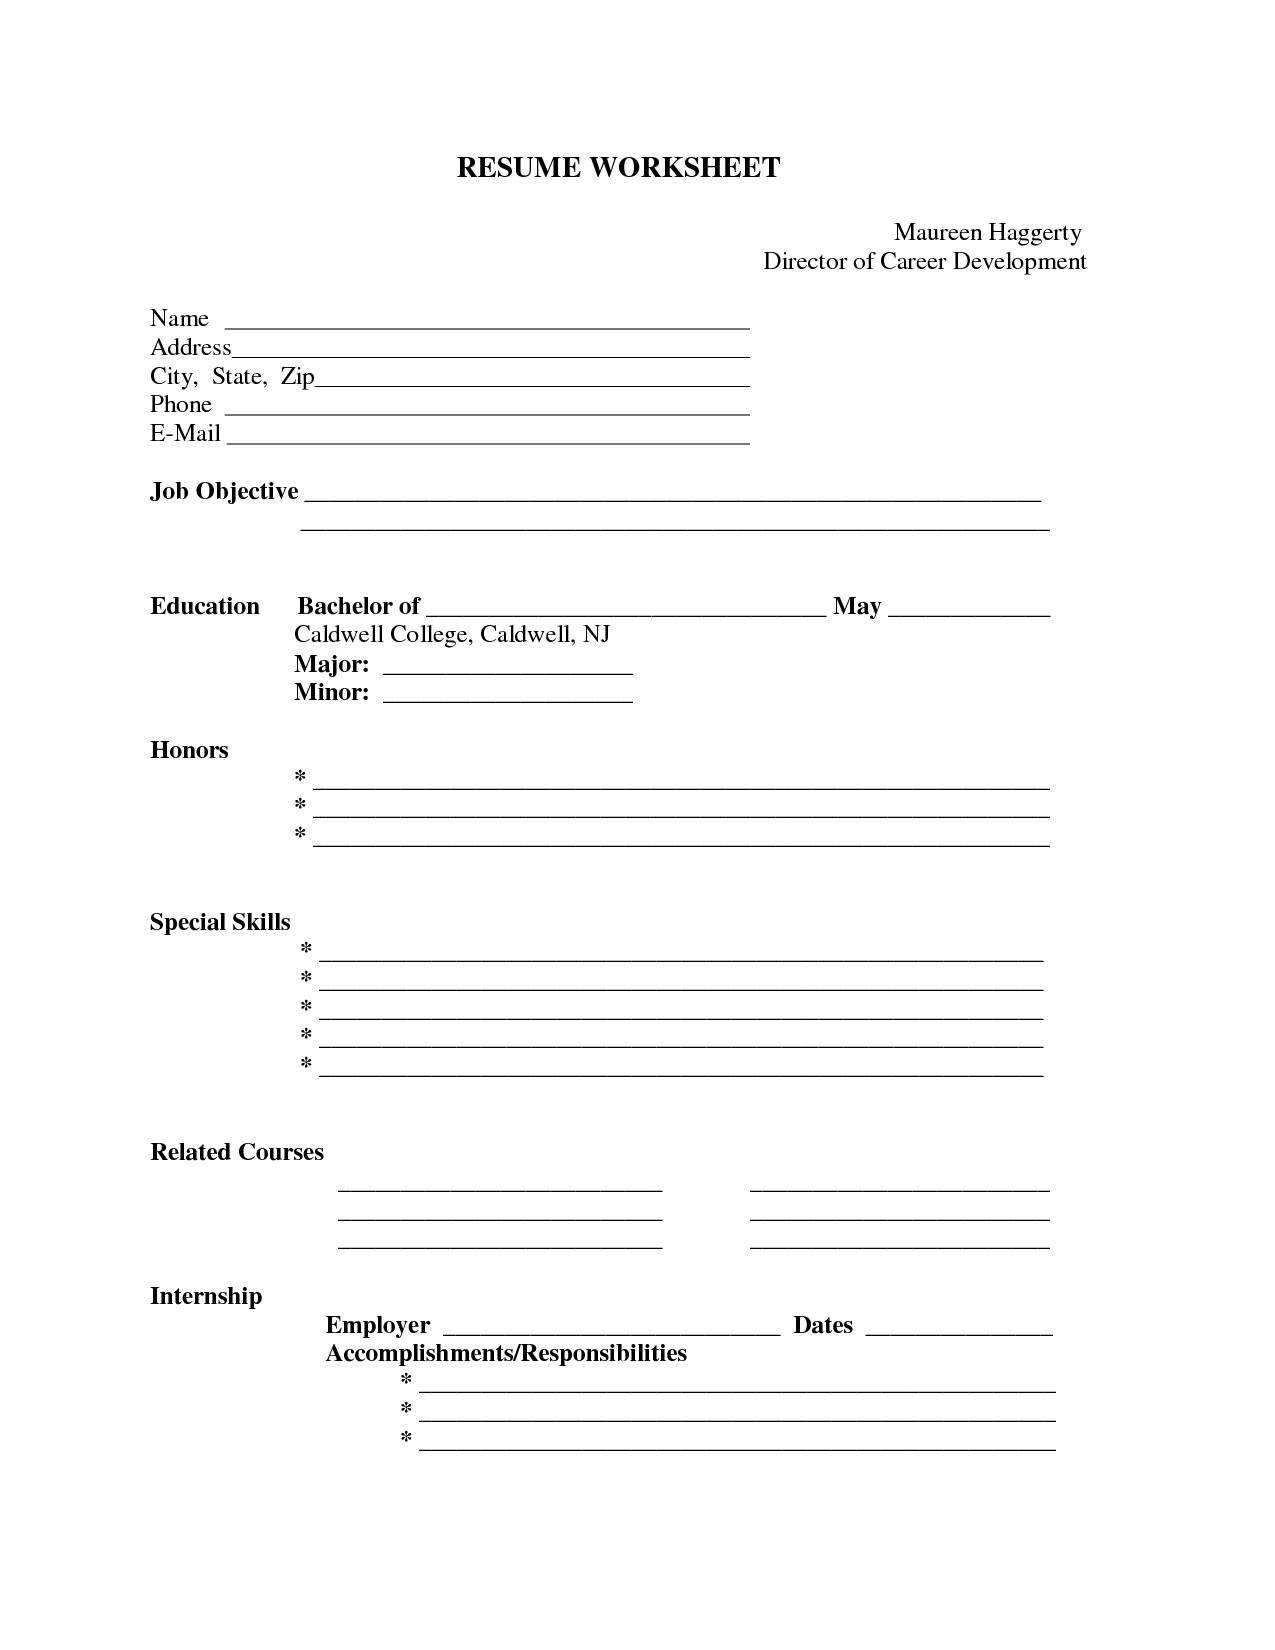 Pin Oleh Jobresume Di Resume Career Termplate Free | Resume Form - Free Printable Fill In The Blank Resume Templates